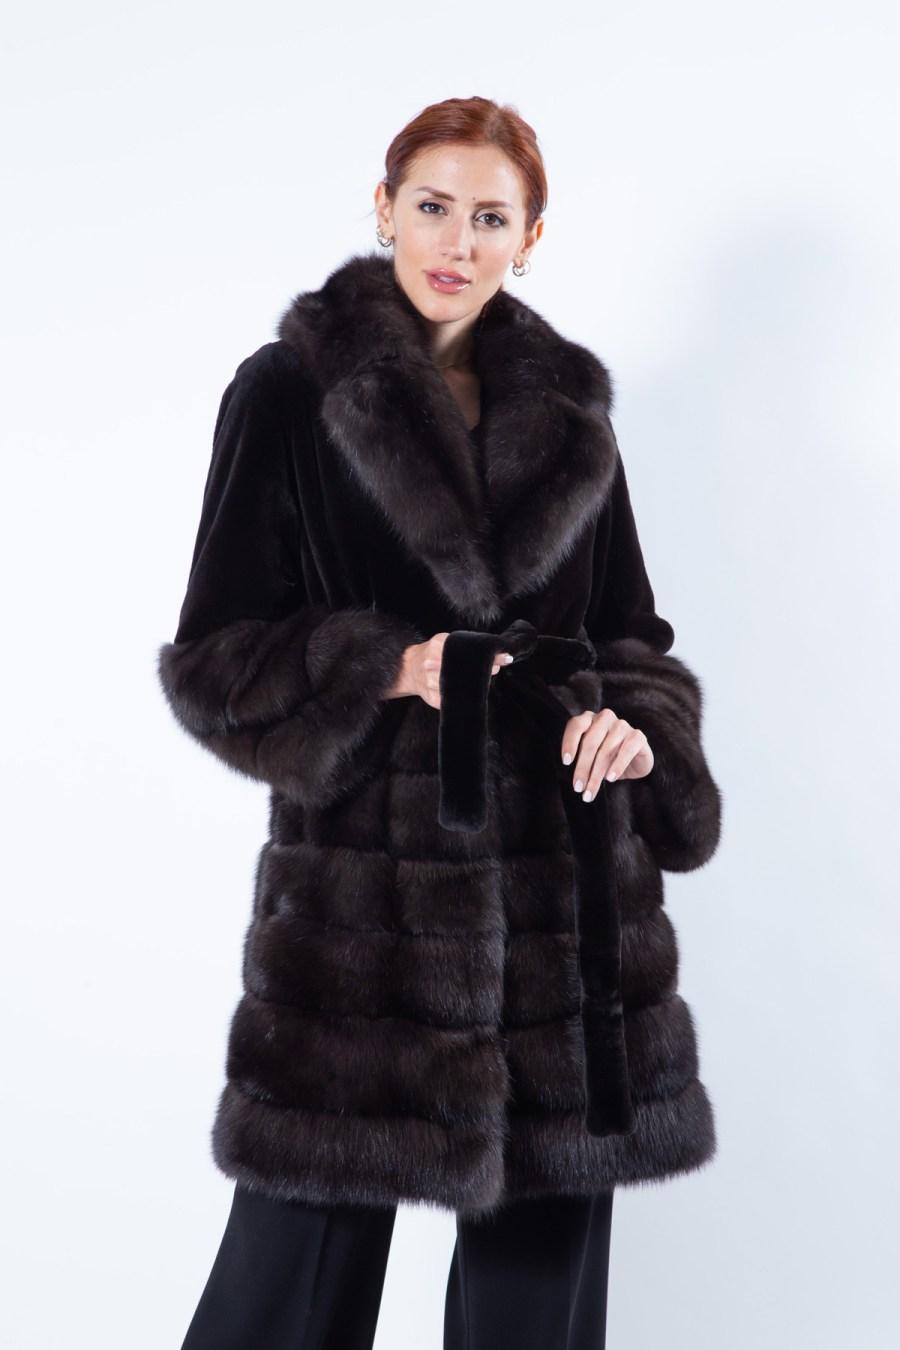 Auro Silvery Sable Jacket | Пальто Ауро из соболя серебристого оттенка - Sarigianni Furs